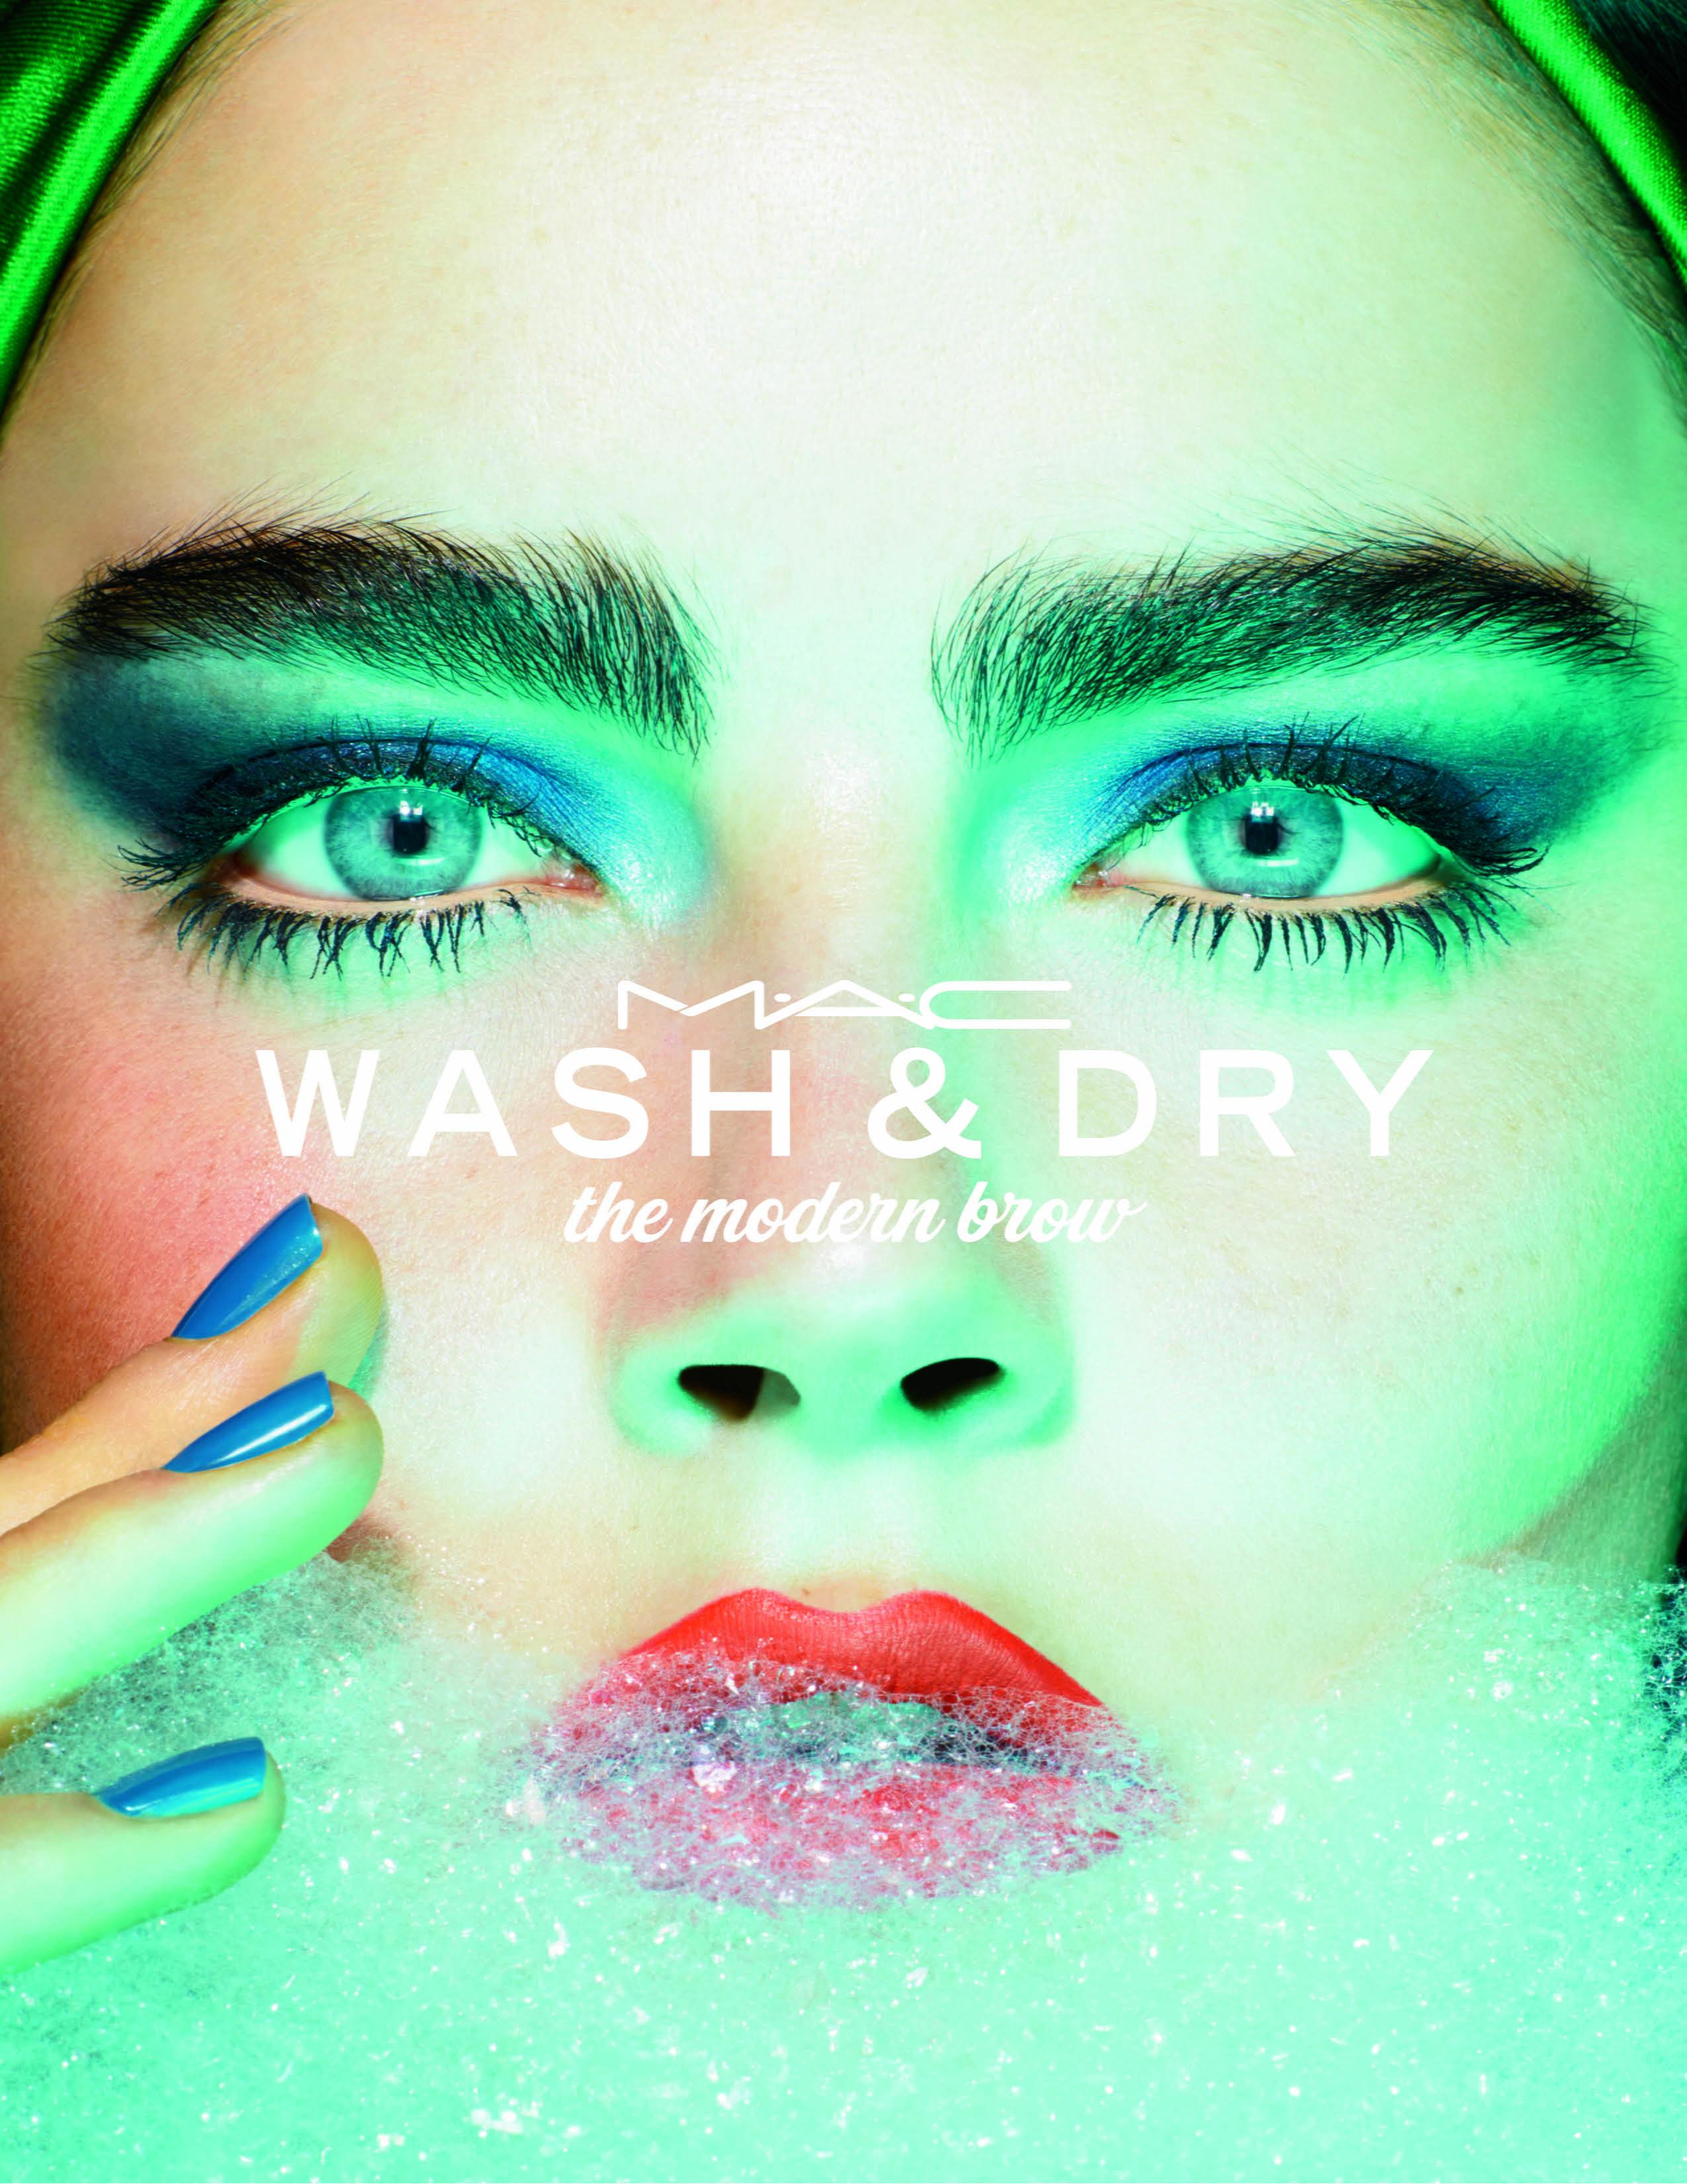 Mac cosmetics коллекция макияжа wash & dry 2015 glam.